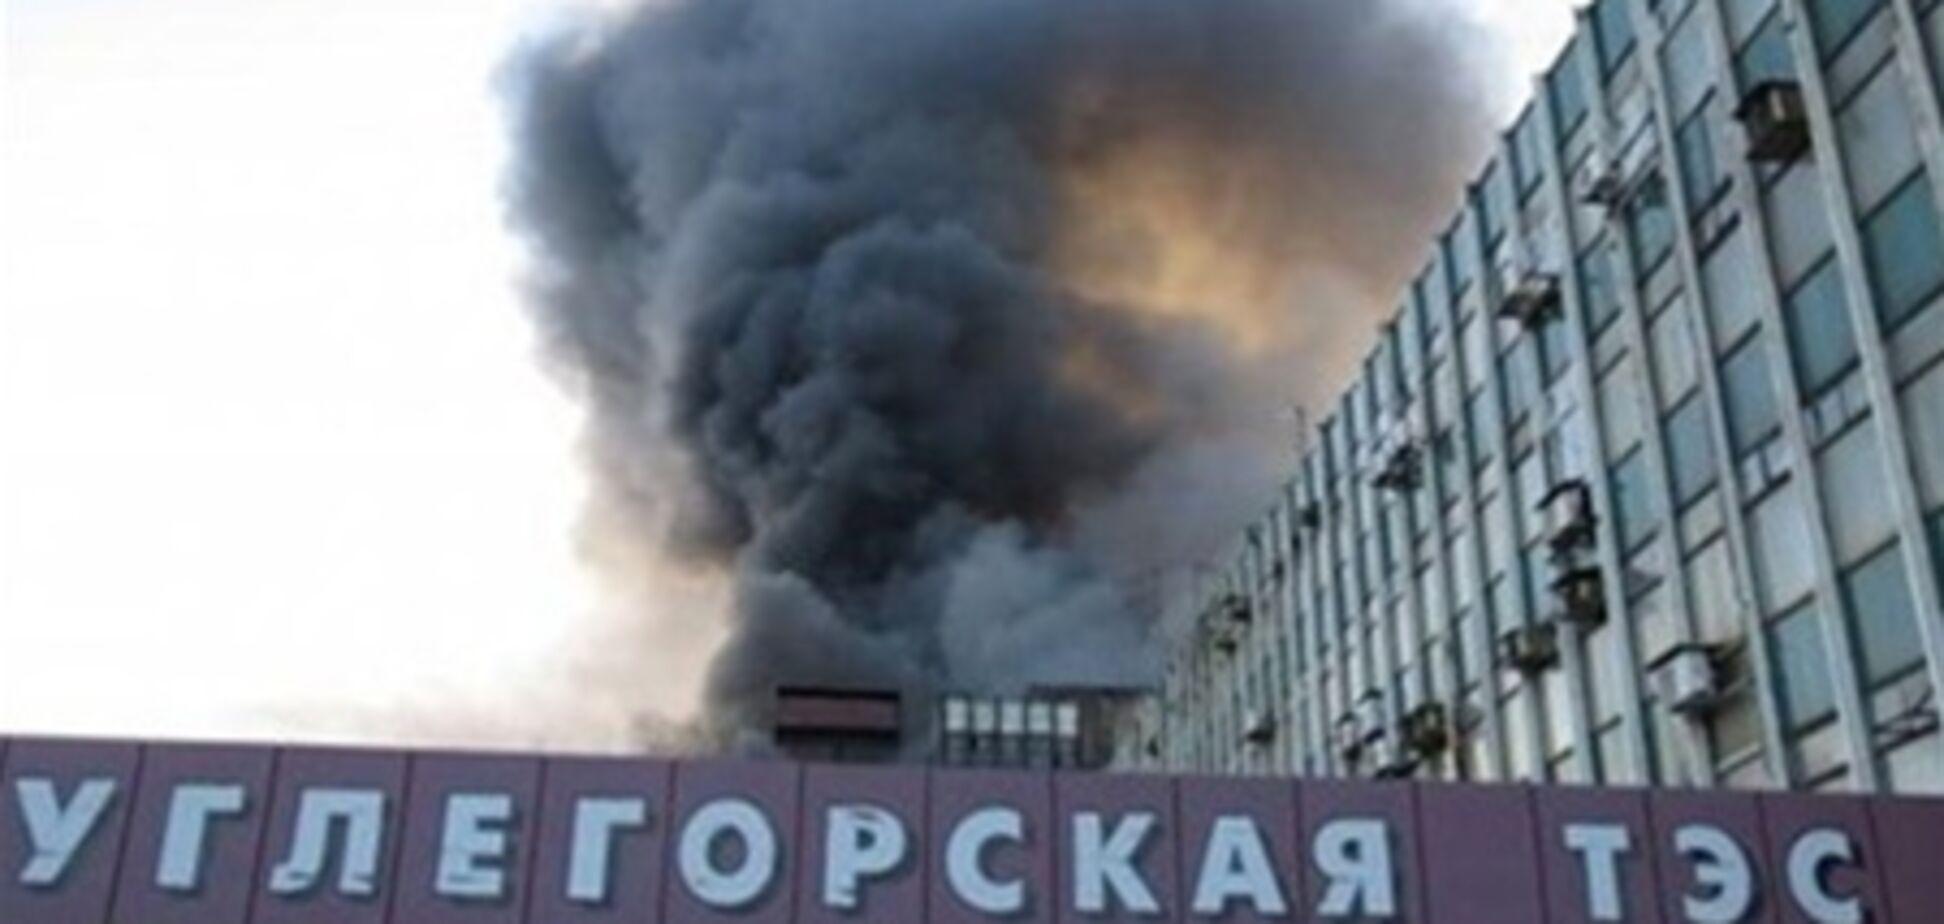 Пожар на Углегорской ТЭС произошел по причине халатности – очевидец